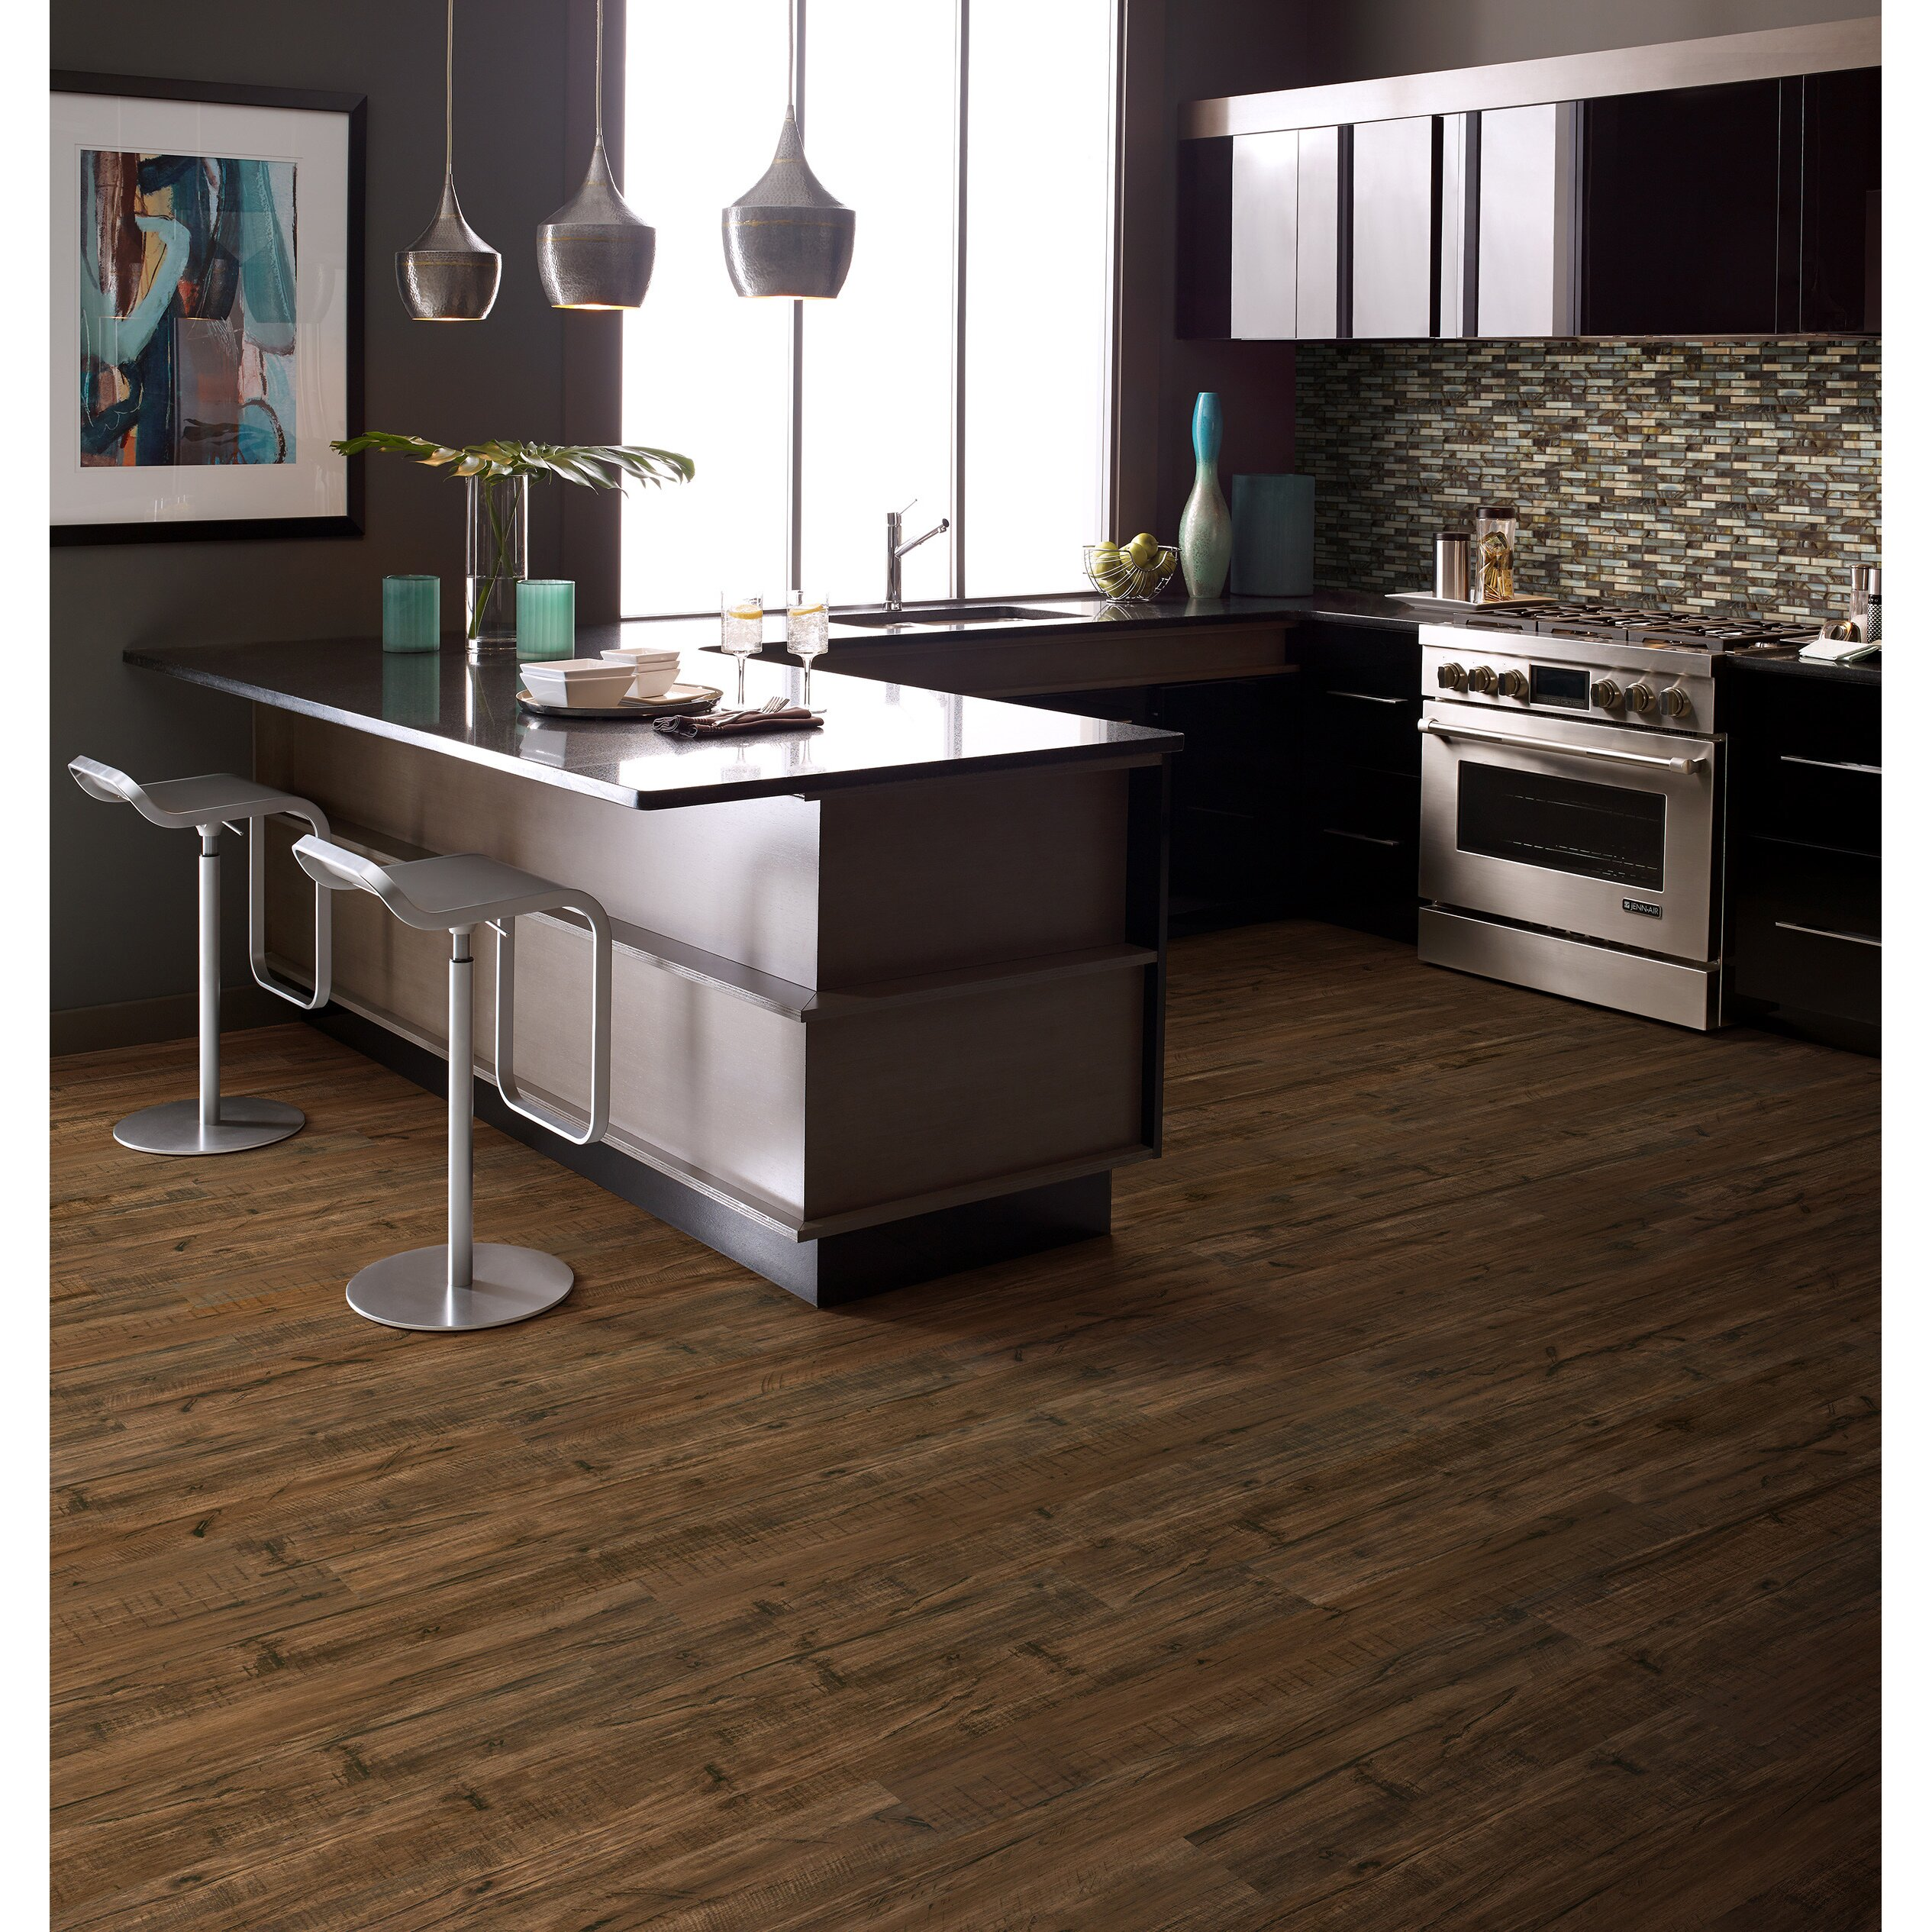 "Hardwood Flooring Darien Ct: Shaw Floors Winsted 6"" X 48"" X 5.5mm Luxury Vinyl Plank In"